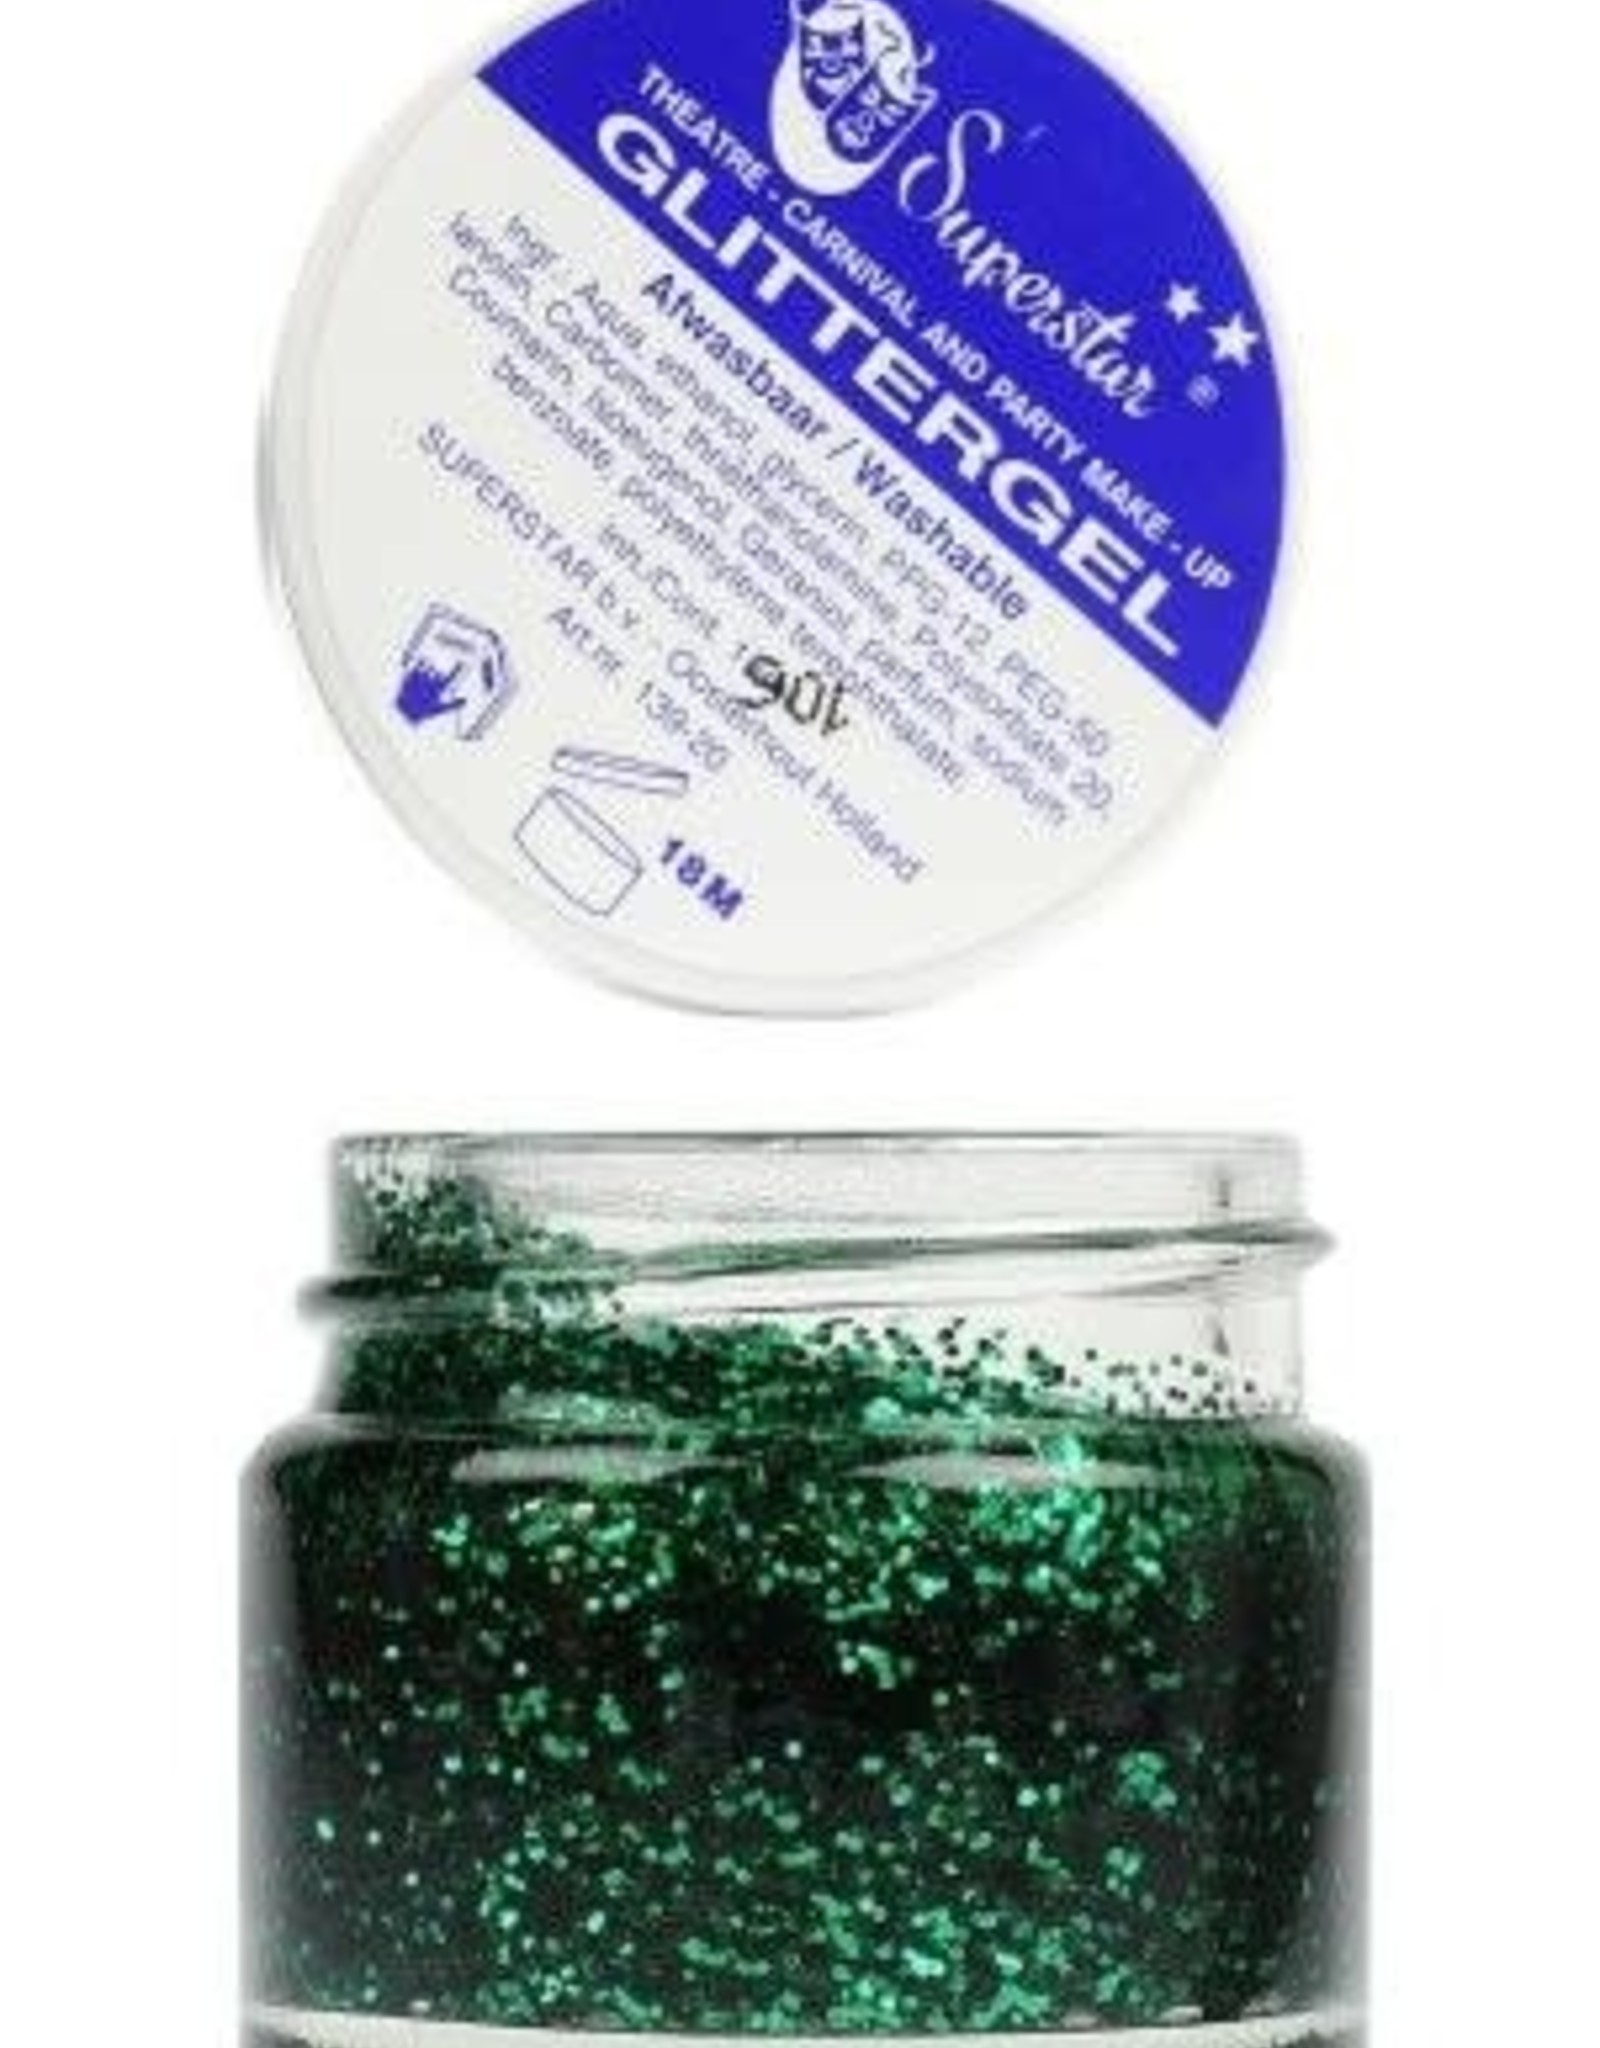 Superstar Glittergel Groen